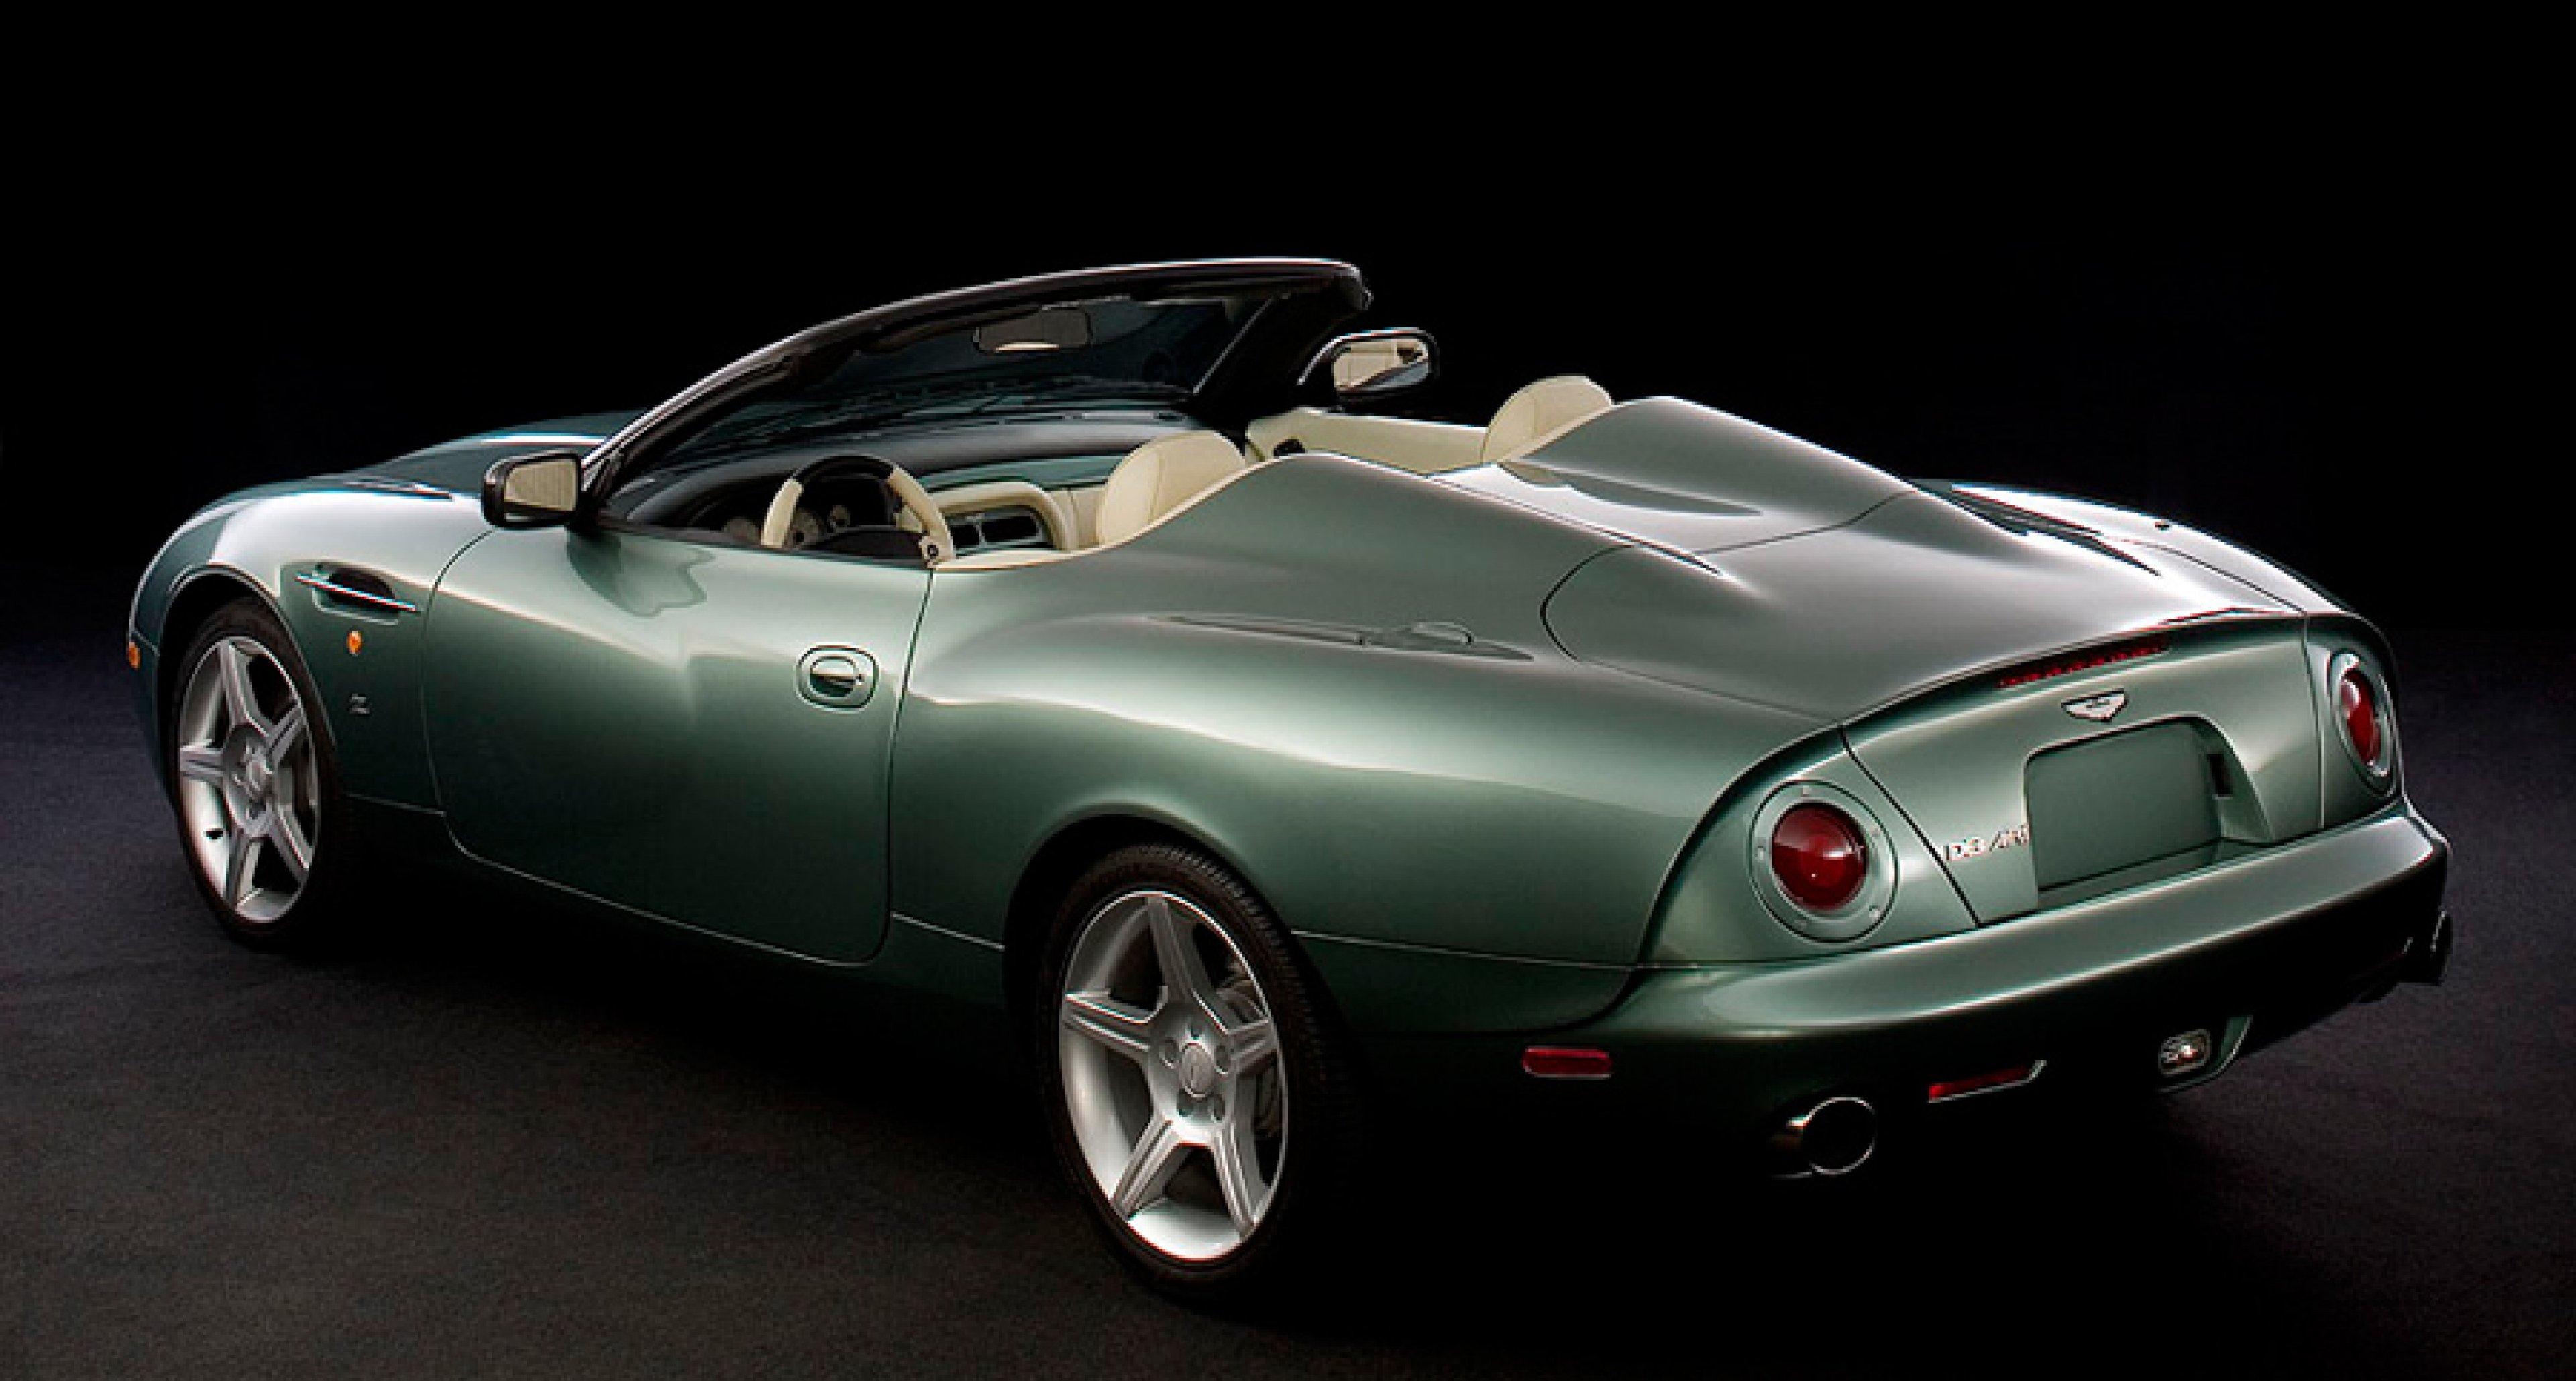 Aston Martin Db Ar1 La Motor Show Car No 1 For California Sr1 Classic Driver Magazine